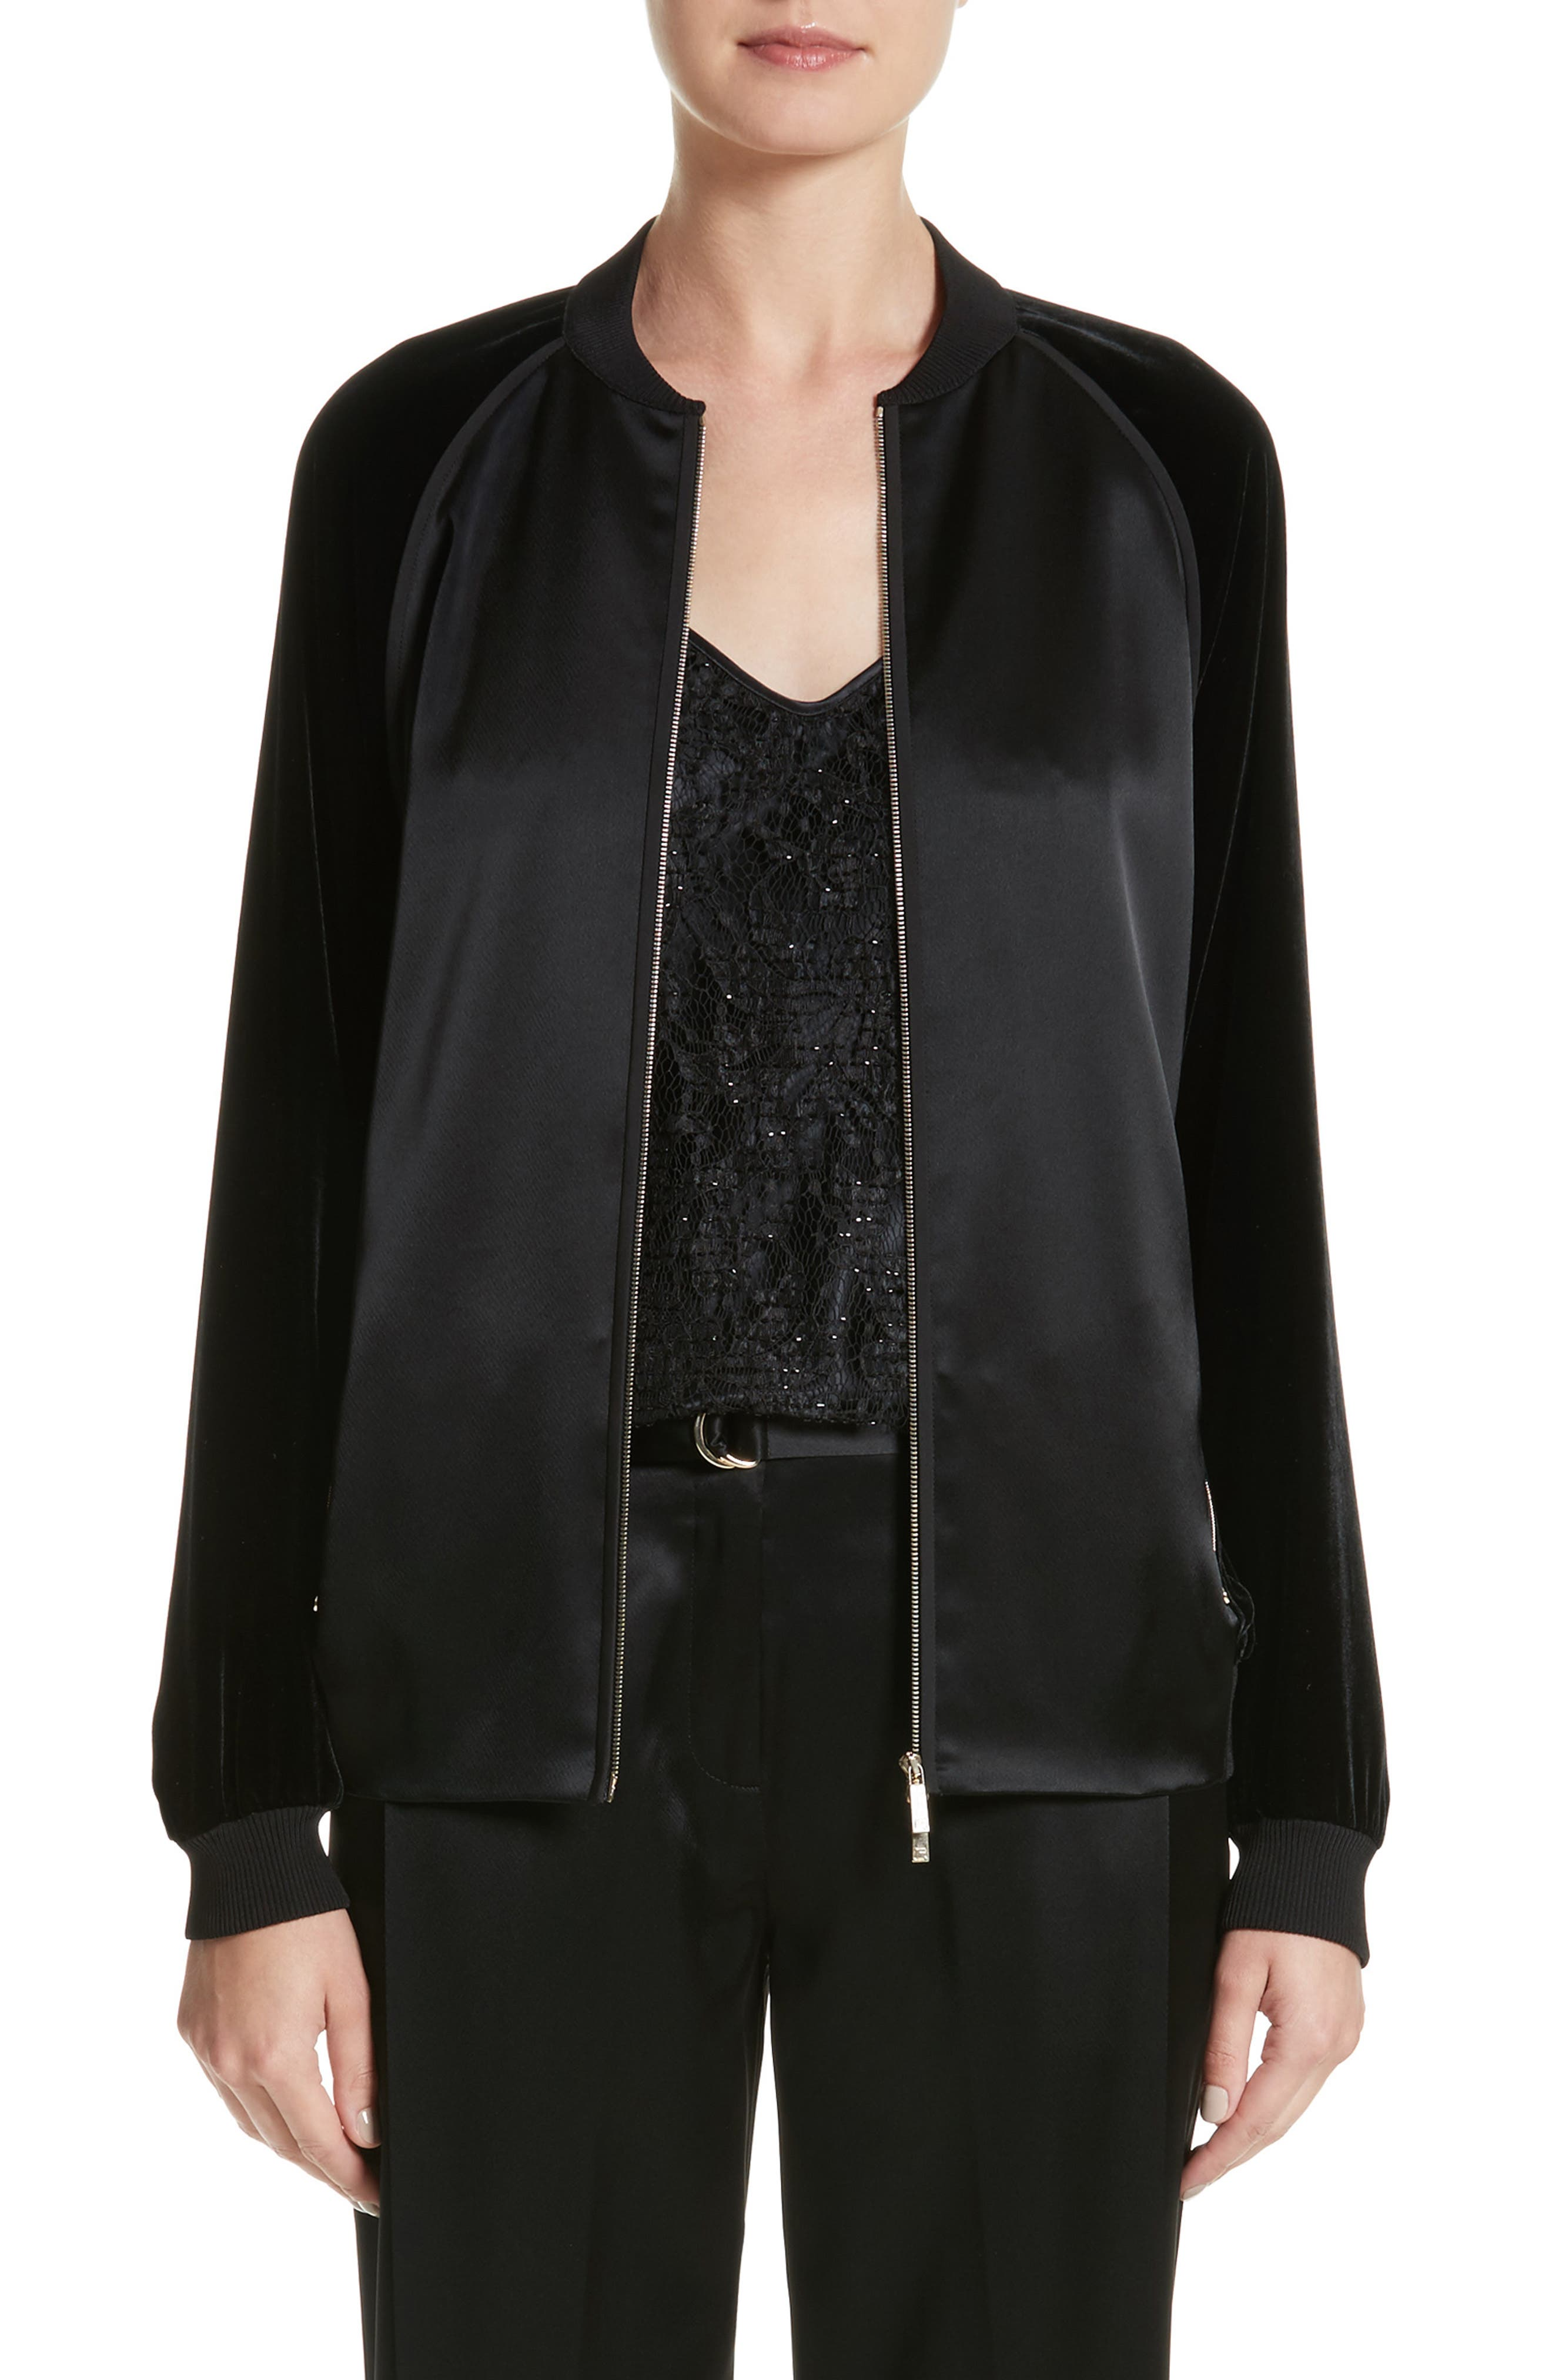 Brea Reverie Satin Cloth Bomber Jacket,                         Main,                         color, 001